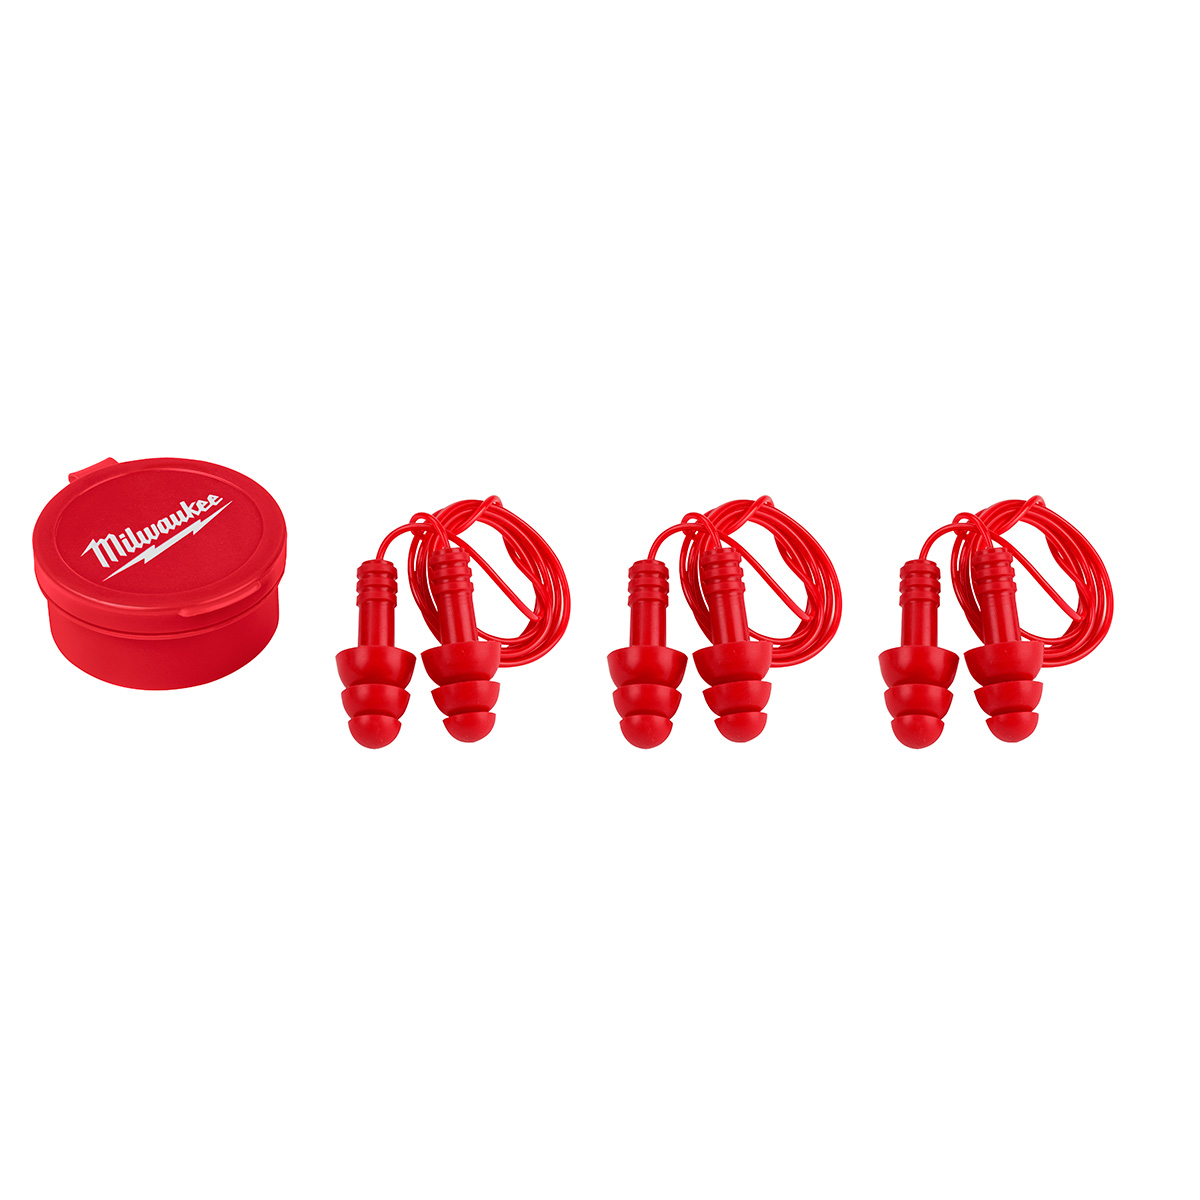 MILWAUKEE 48-73-3151 REUSABLE CORDED EARPLUGS 3 PK